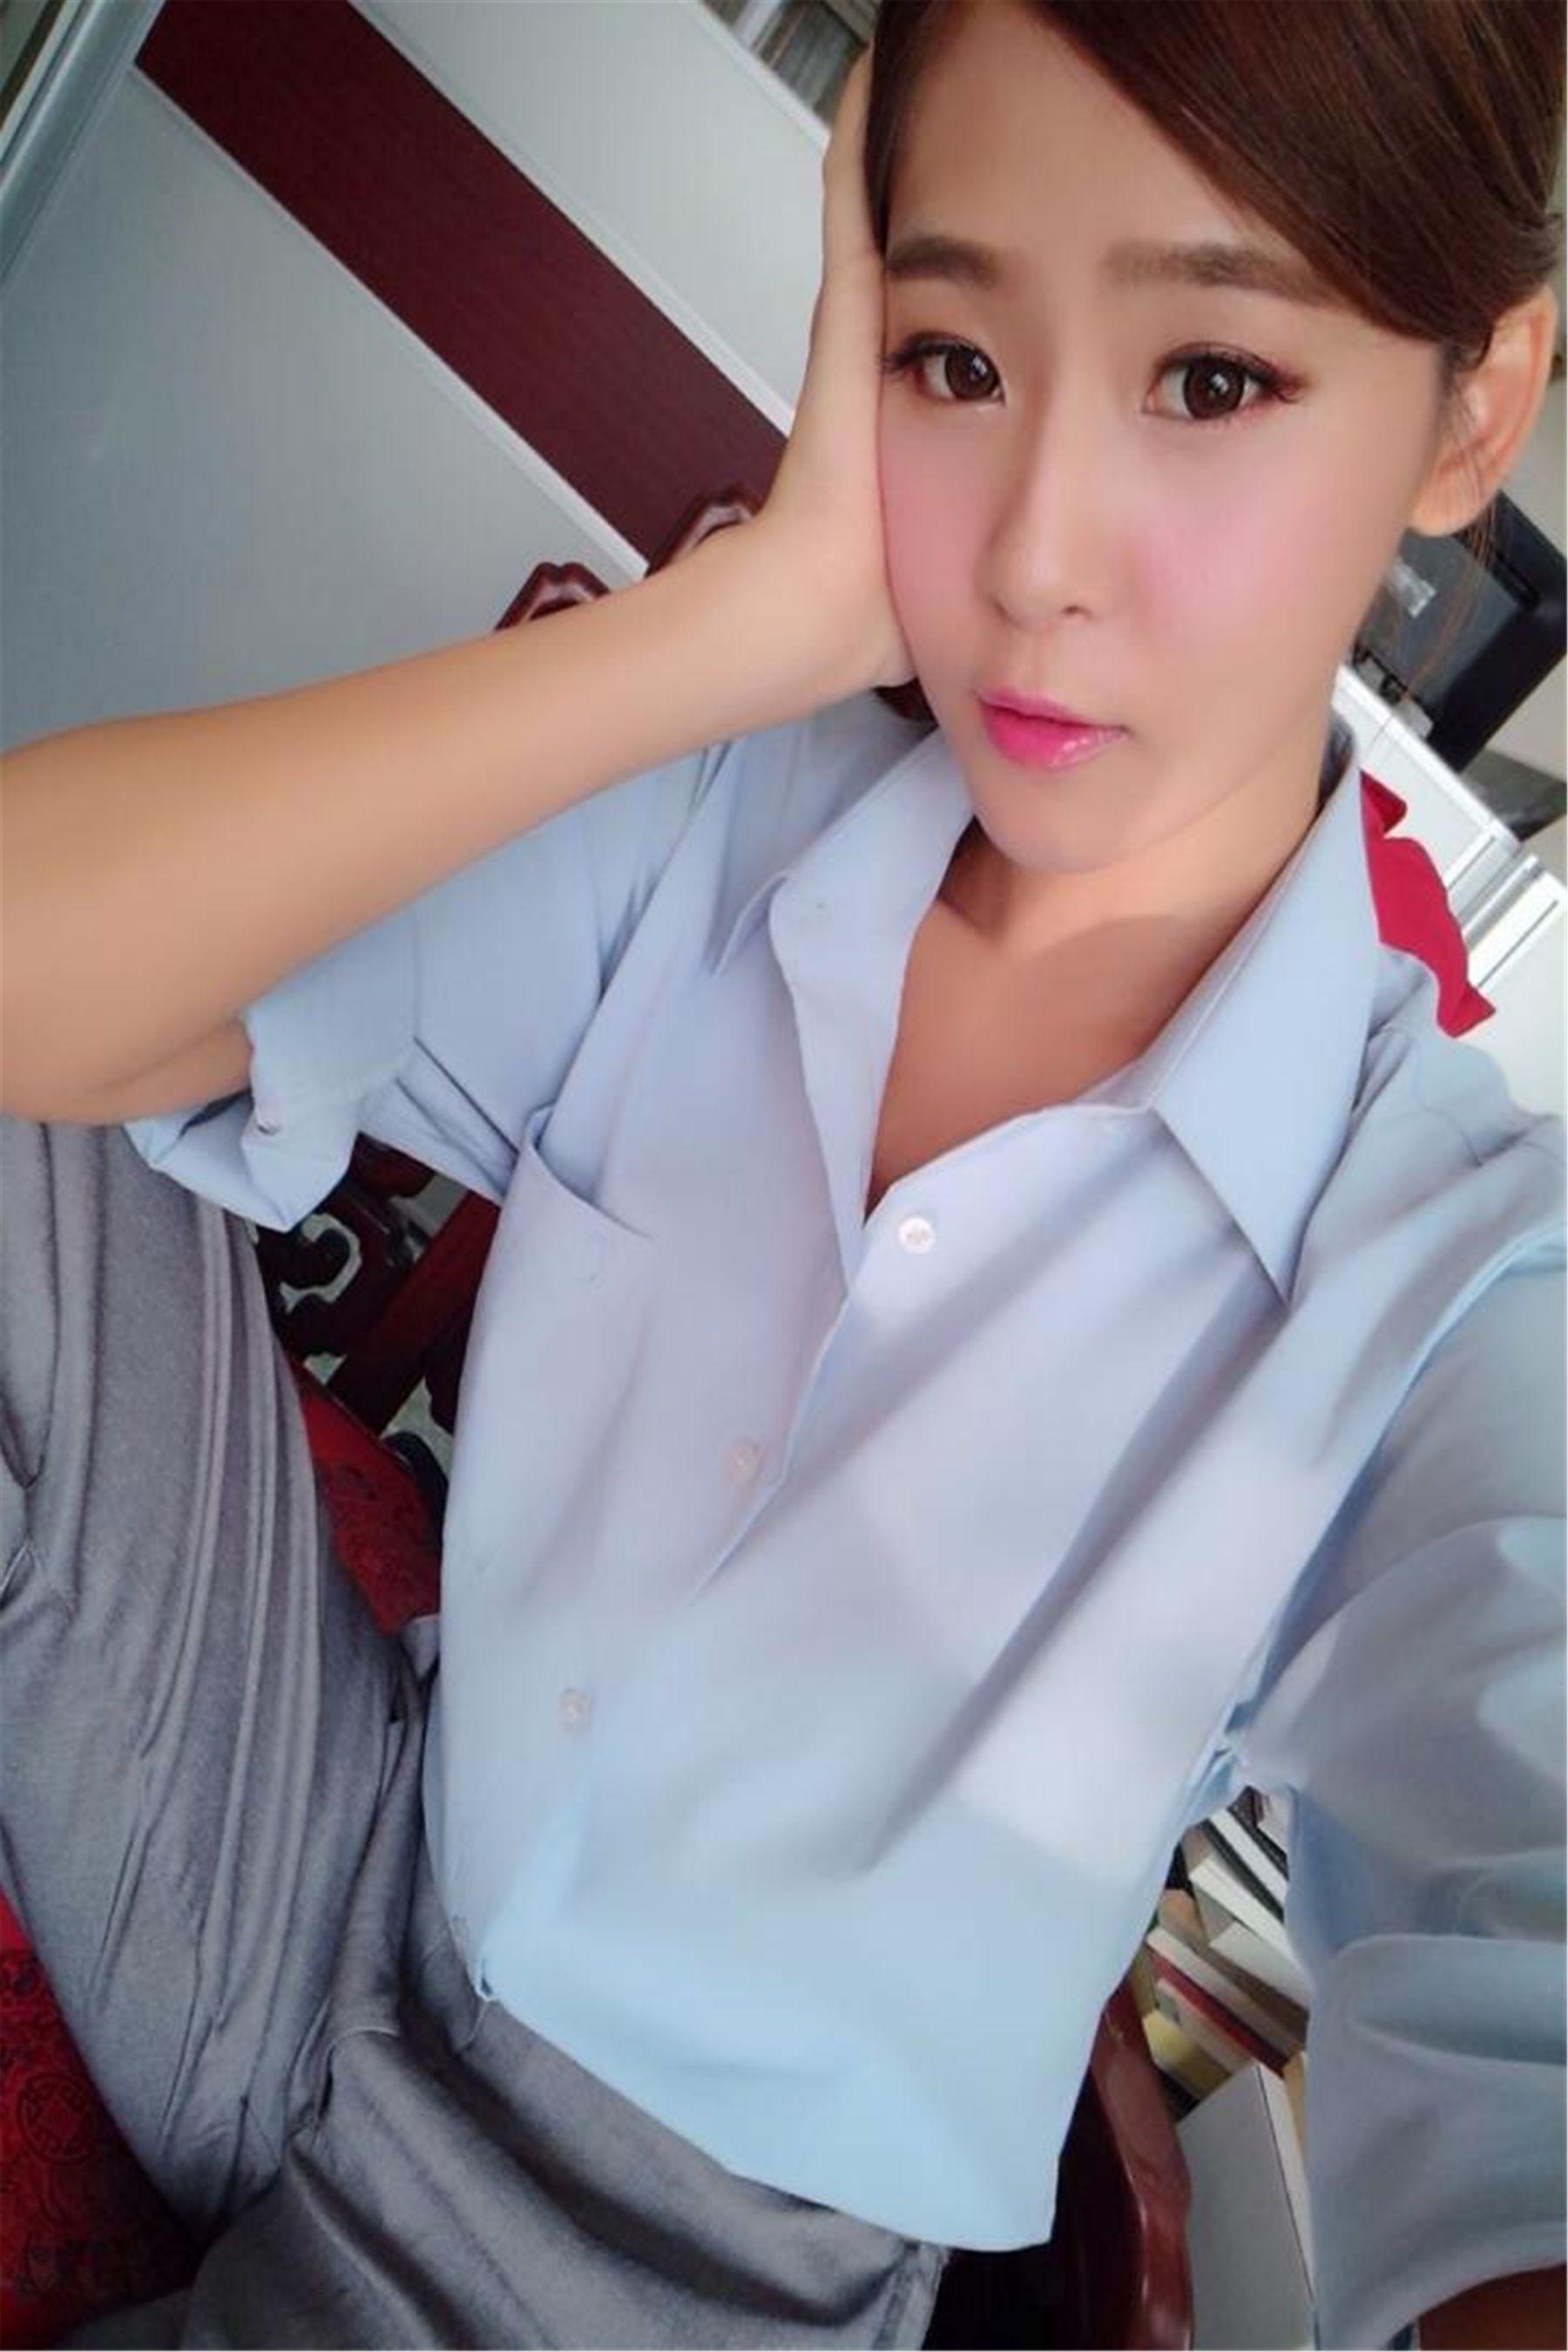 VOL.147 [台湾正妹]清纯正妹:Winnie小雪(庄咏惠,庄温妮,腿模Winnie)高品质写真套图(70P)